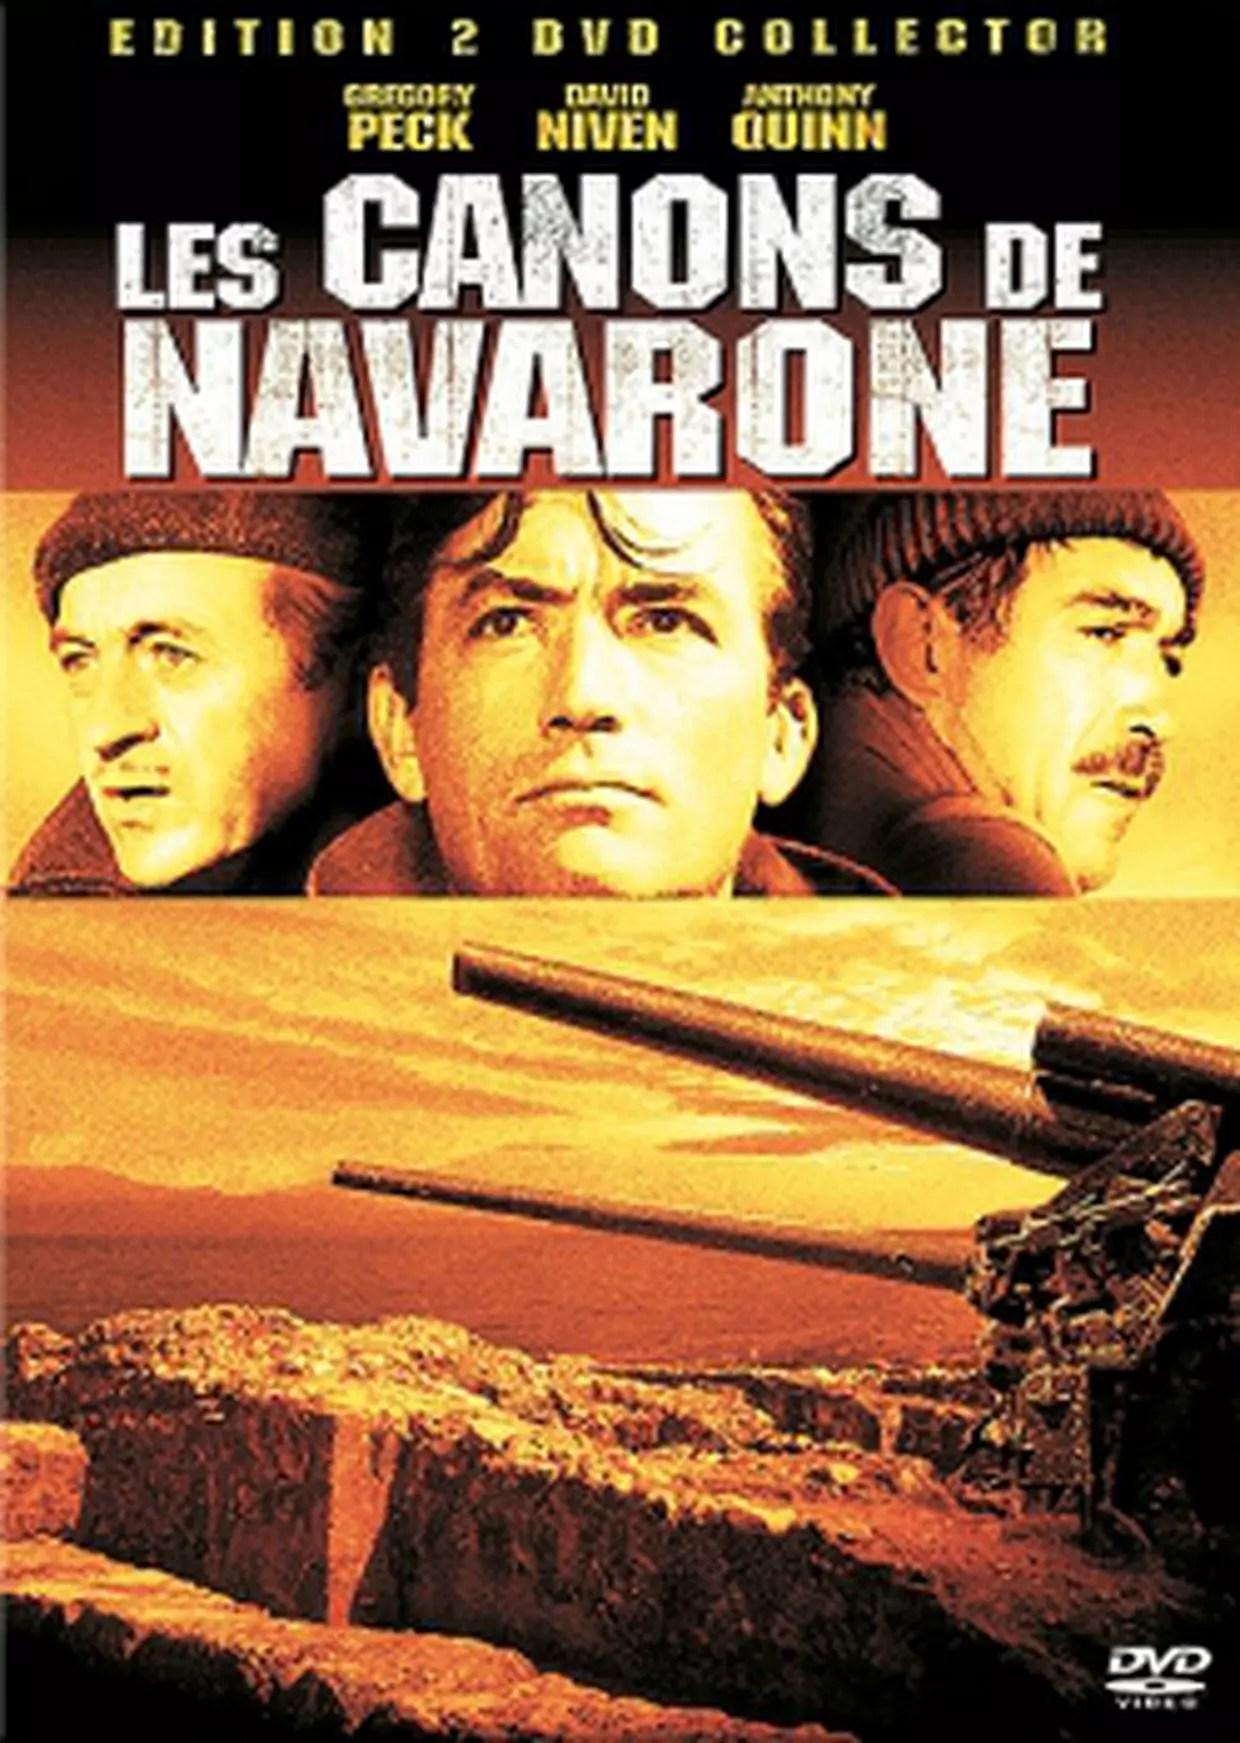 Les Canons De Navarone Streaming : canons, navarone, streaming, Canons, Navarone, Bande, Annonce, Film,, Séances,, Streaming,, Sortie,